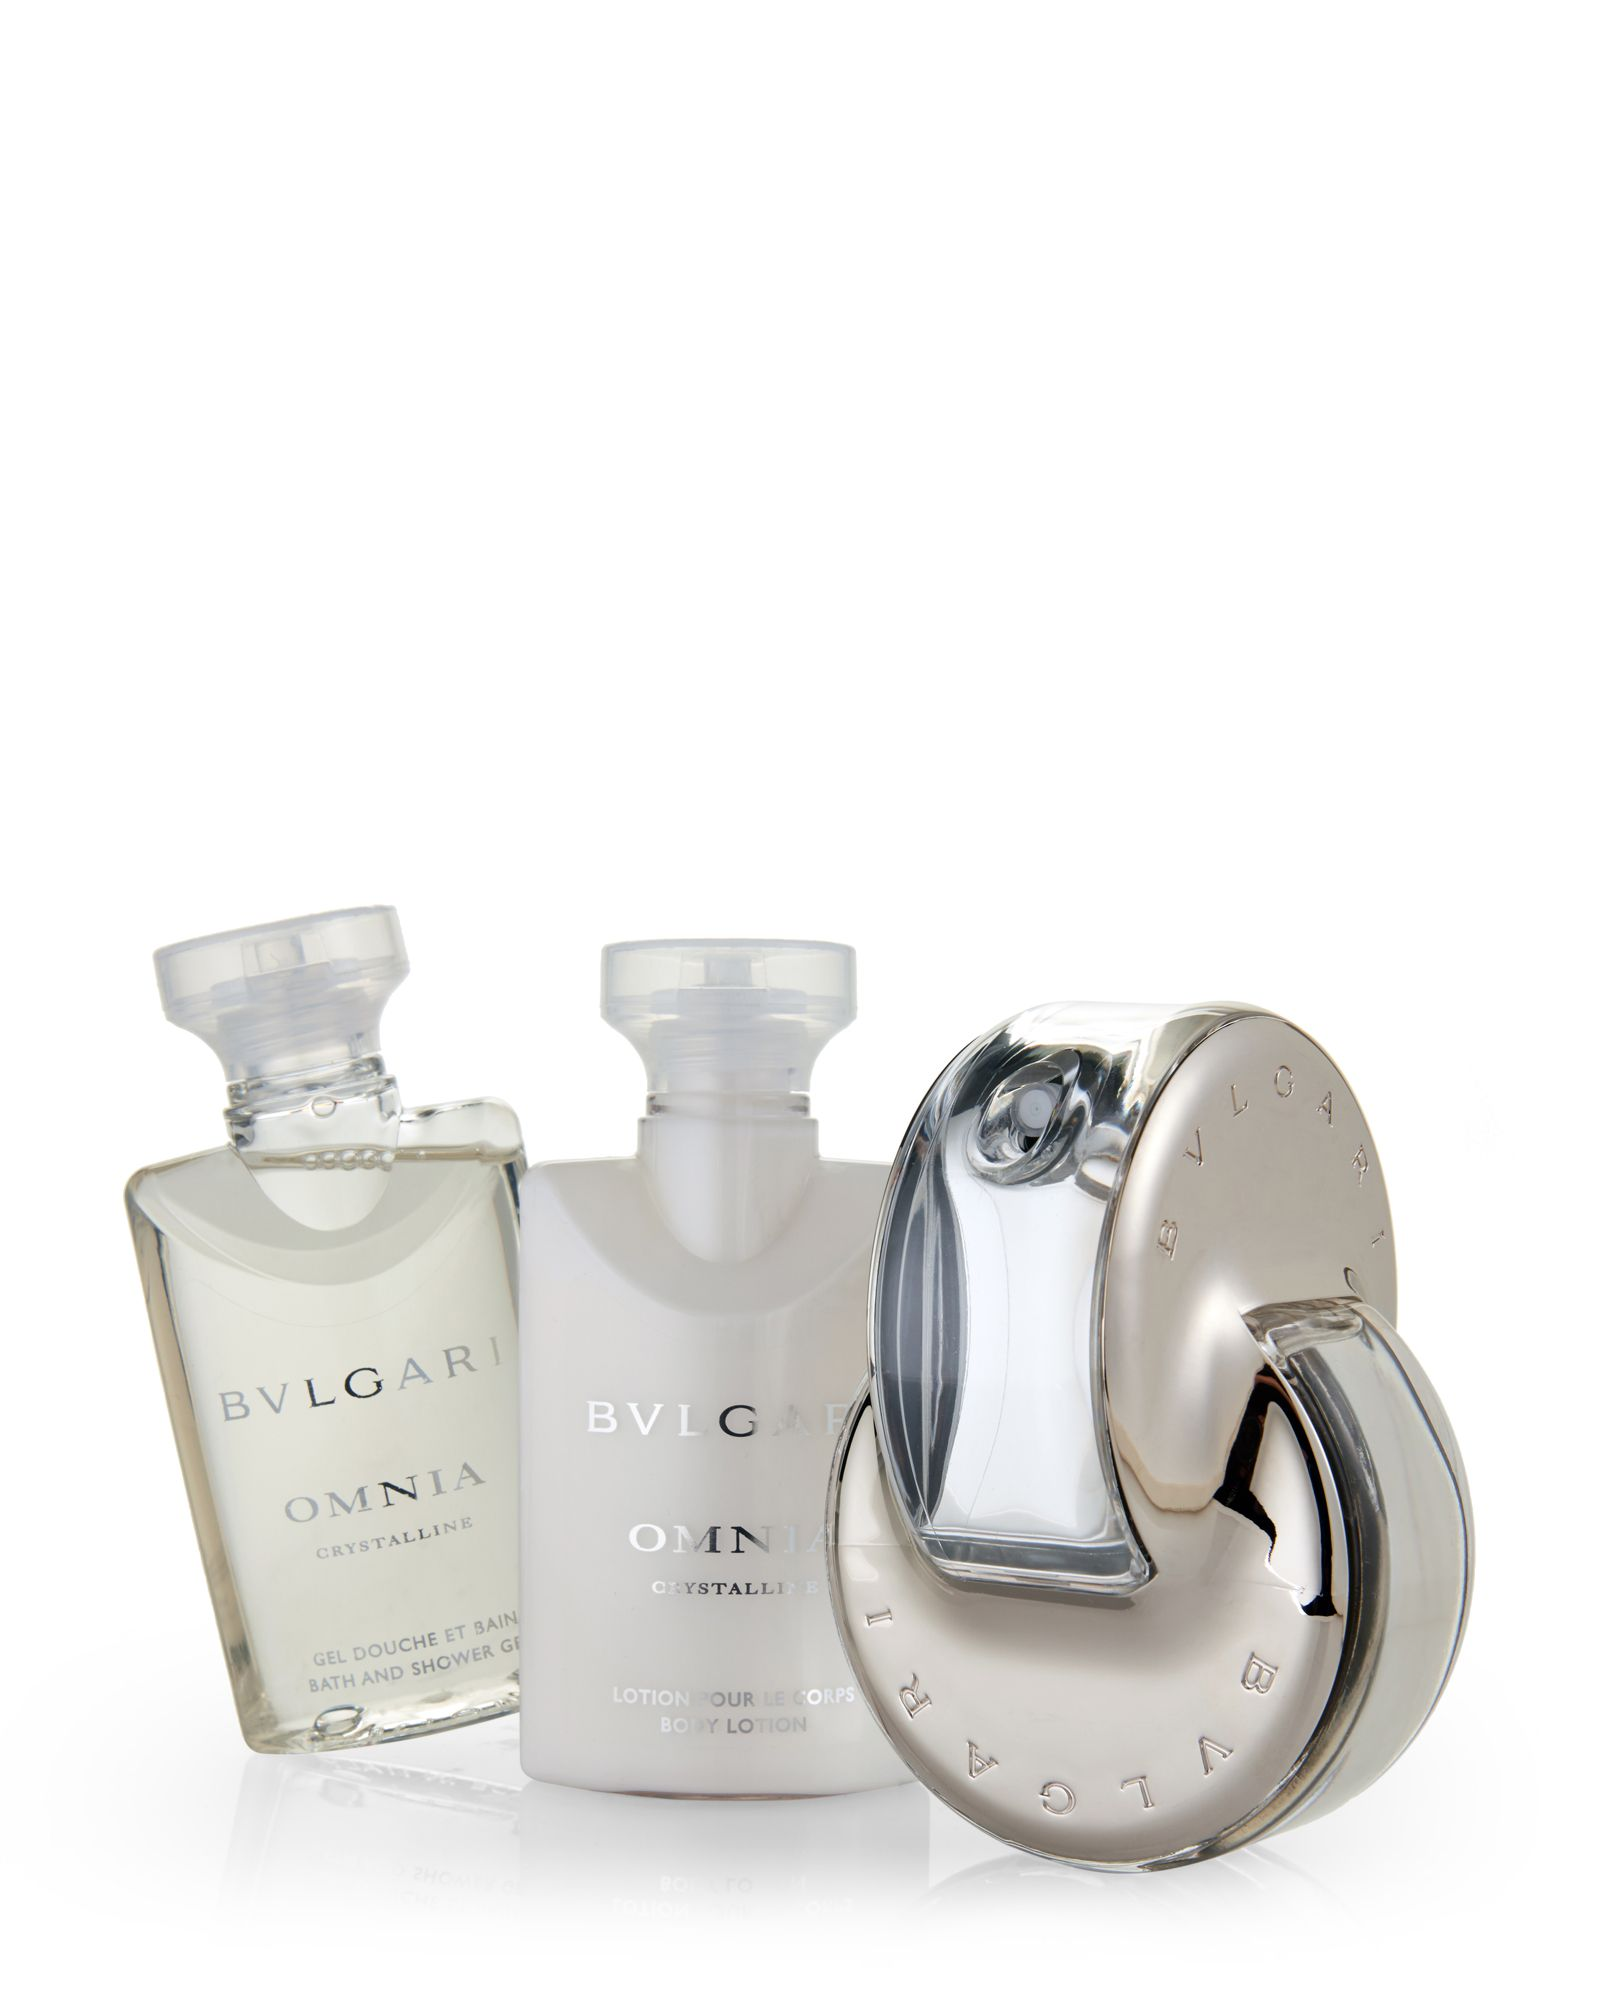 Bvlgari Omnia Crystalline 3-Piece Fragrance Set